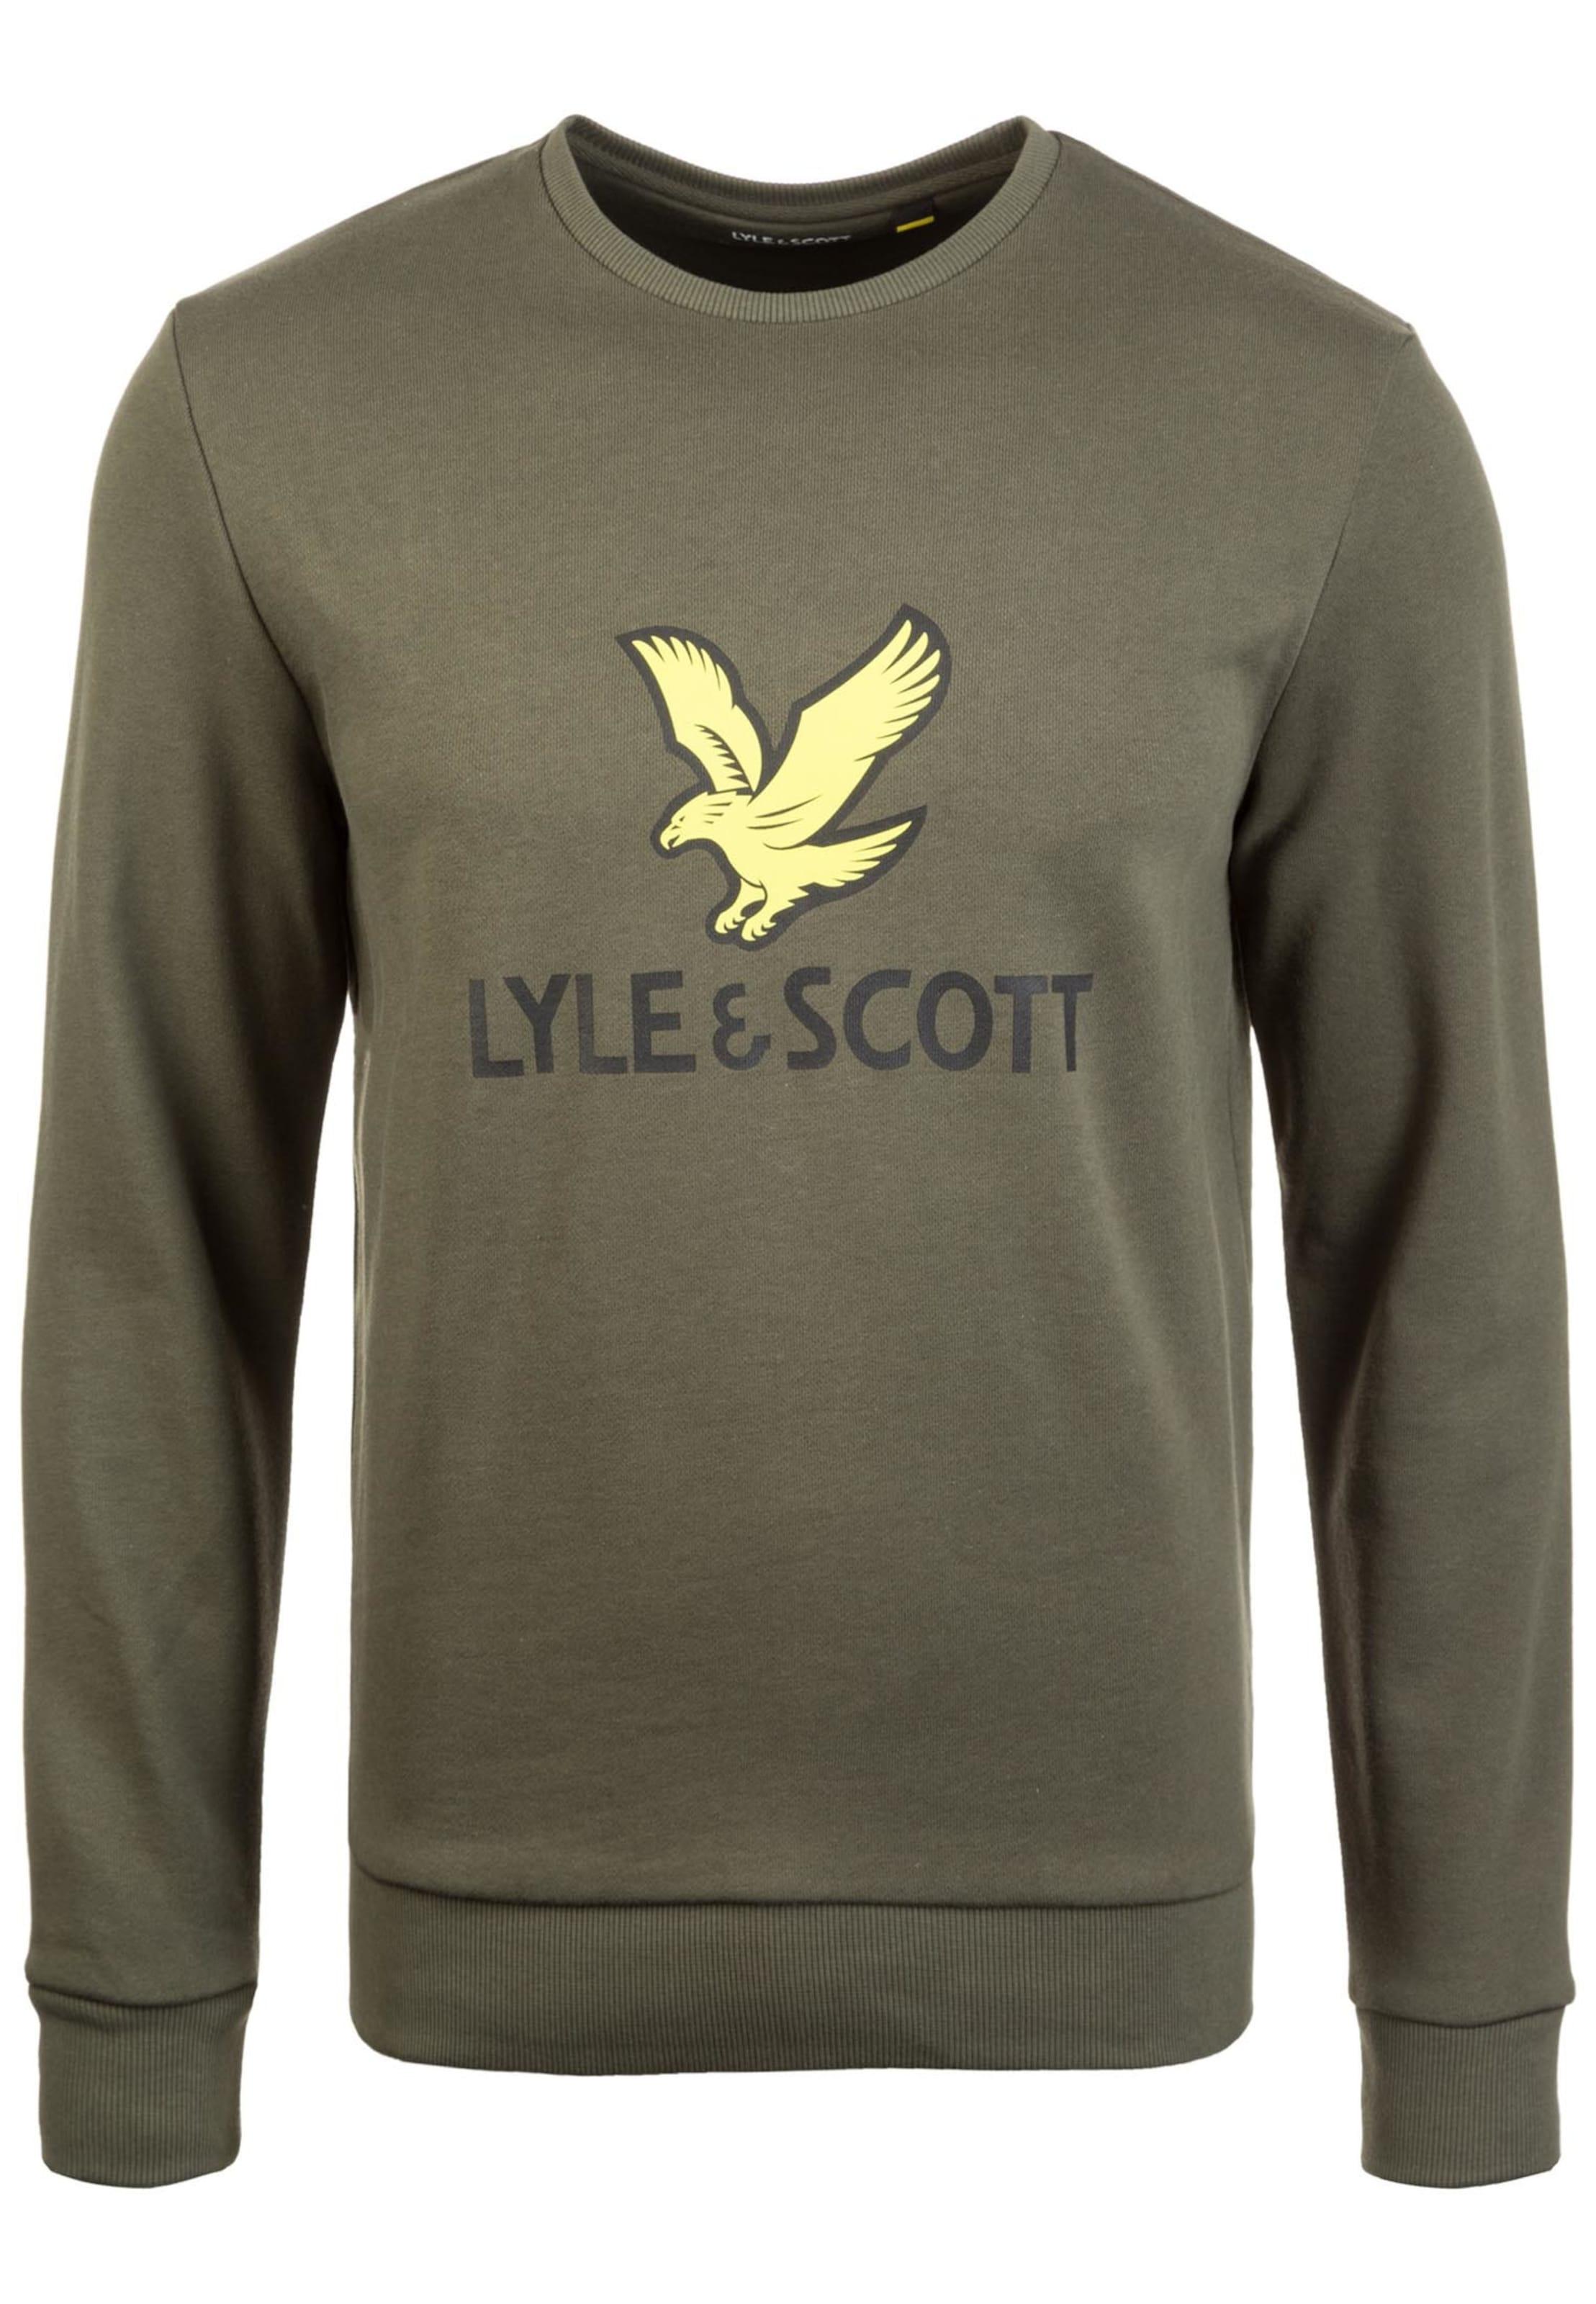 Sweat shirt PastelKaki Lyleamp; Scott Noir En Jaune 45c3LqjAR